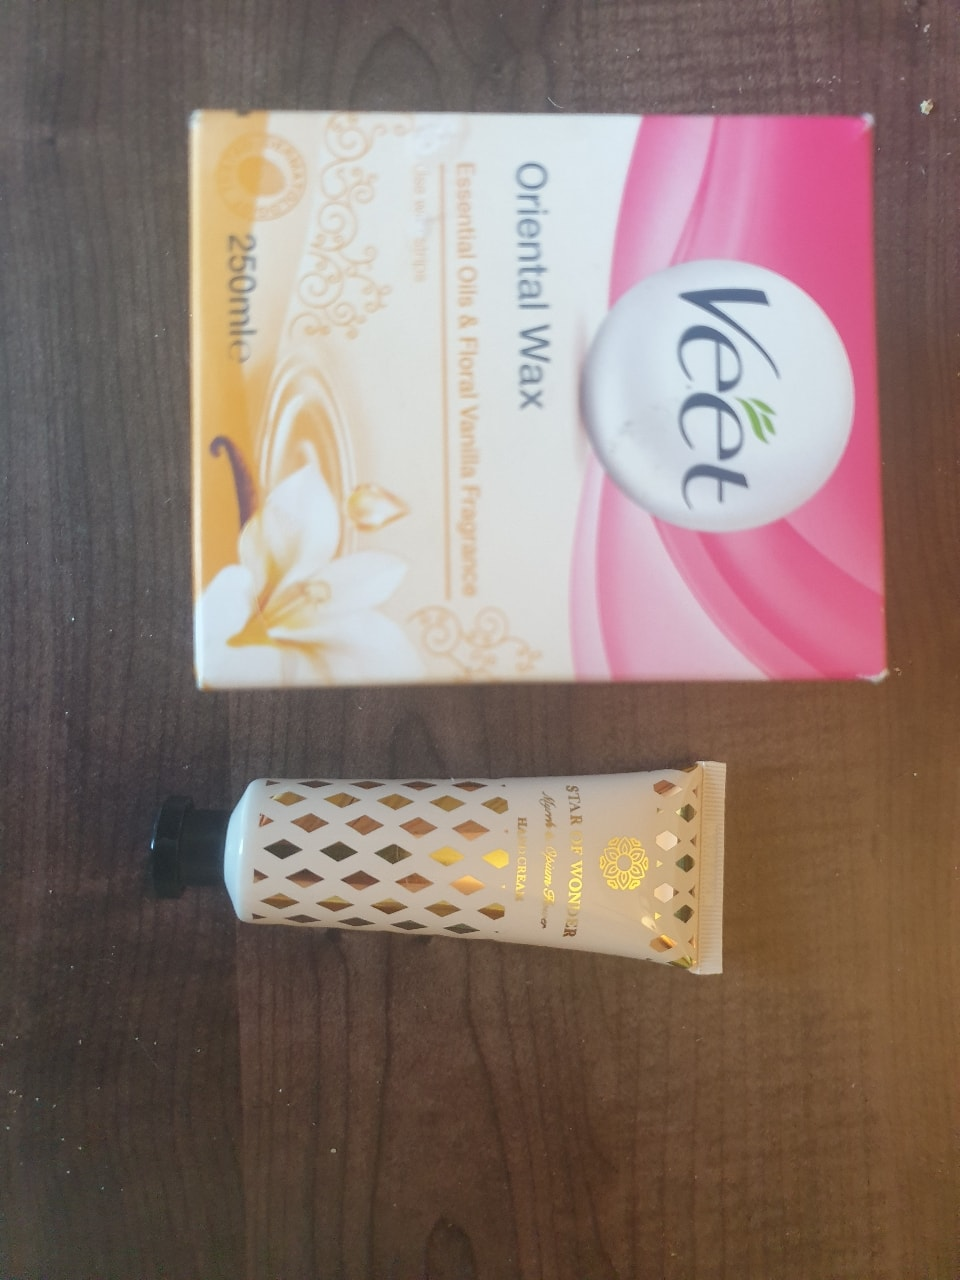 Veet wax, tube of hand cream